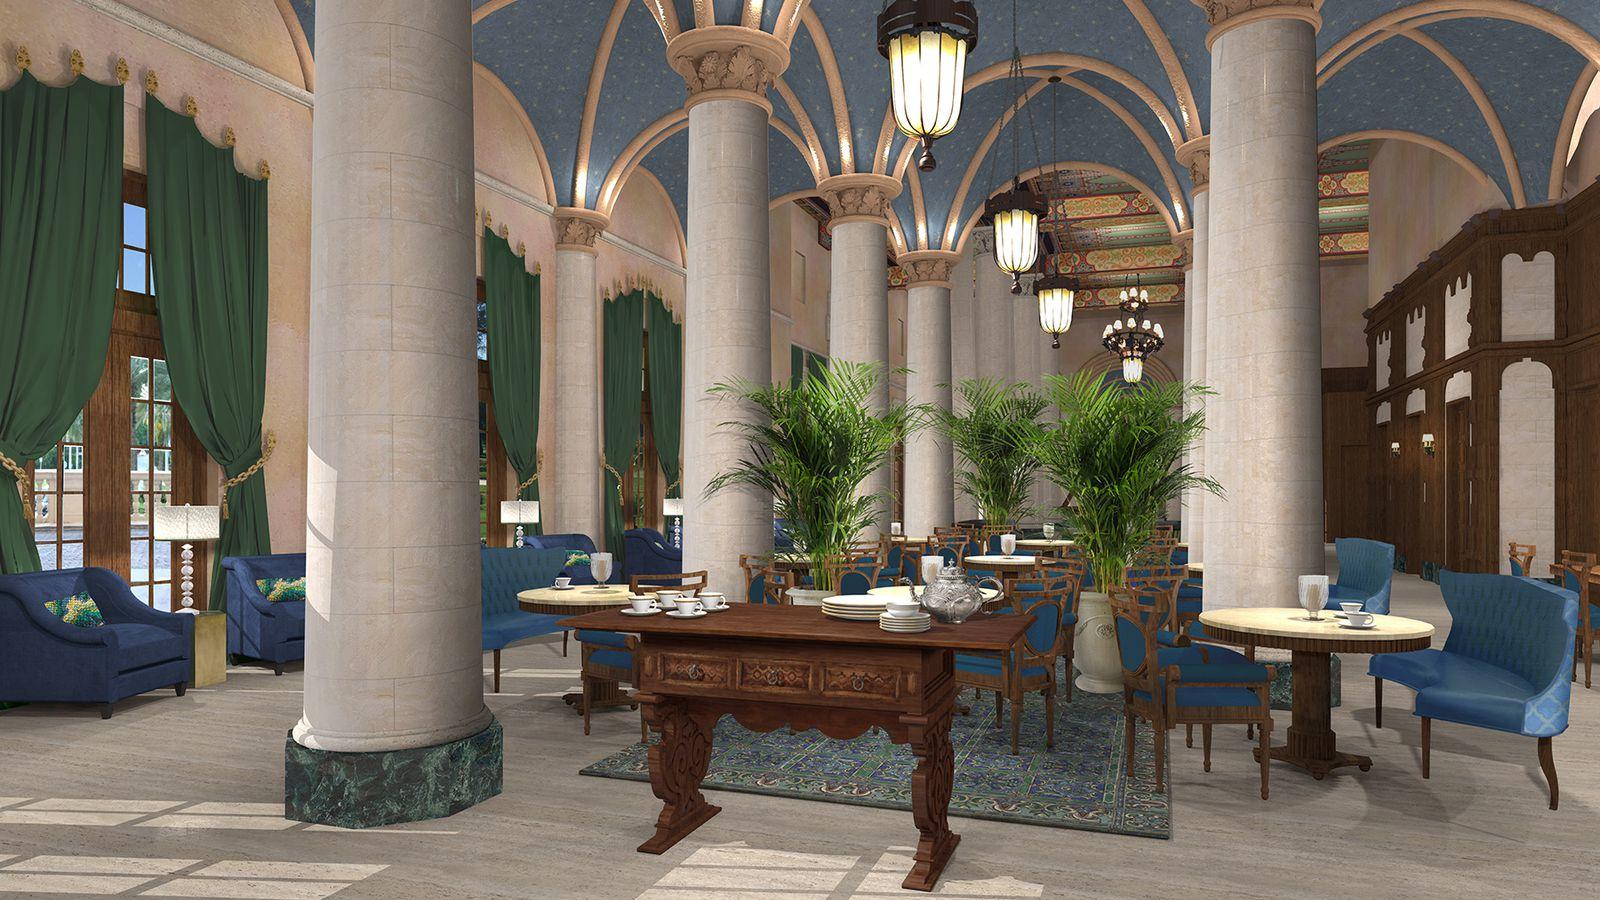 Miami S Historic Biltmore Hotel To Undergo Lobby